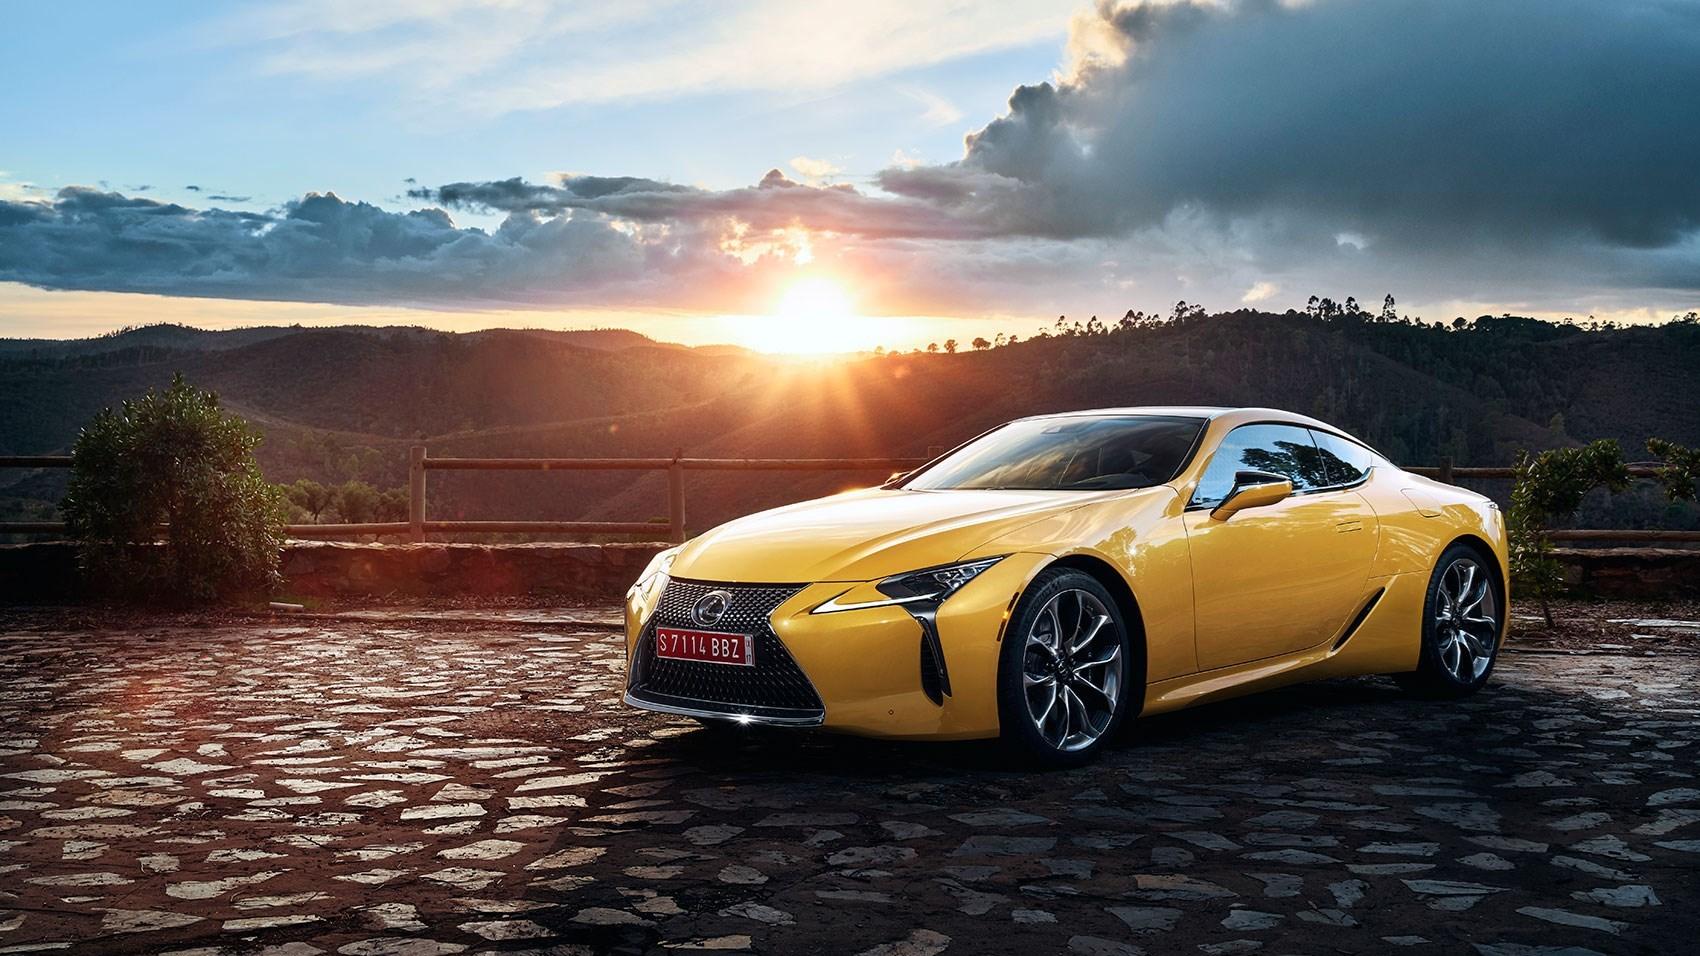 ... Lexus LC Launch Edition: Itu0027s Now On ...